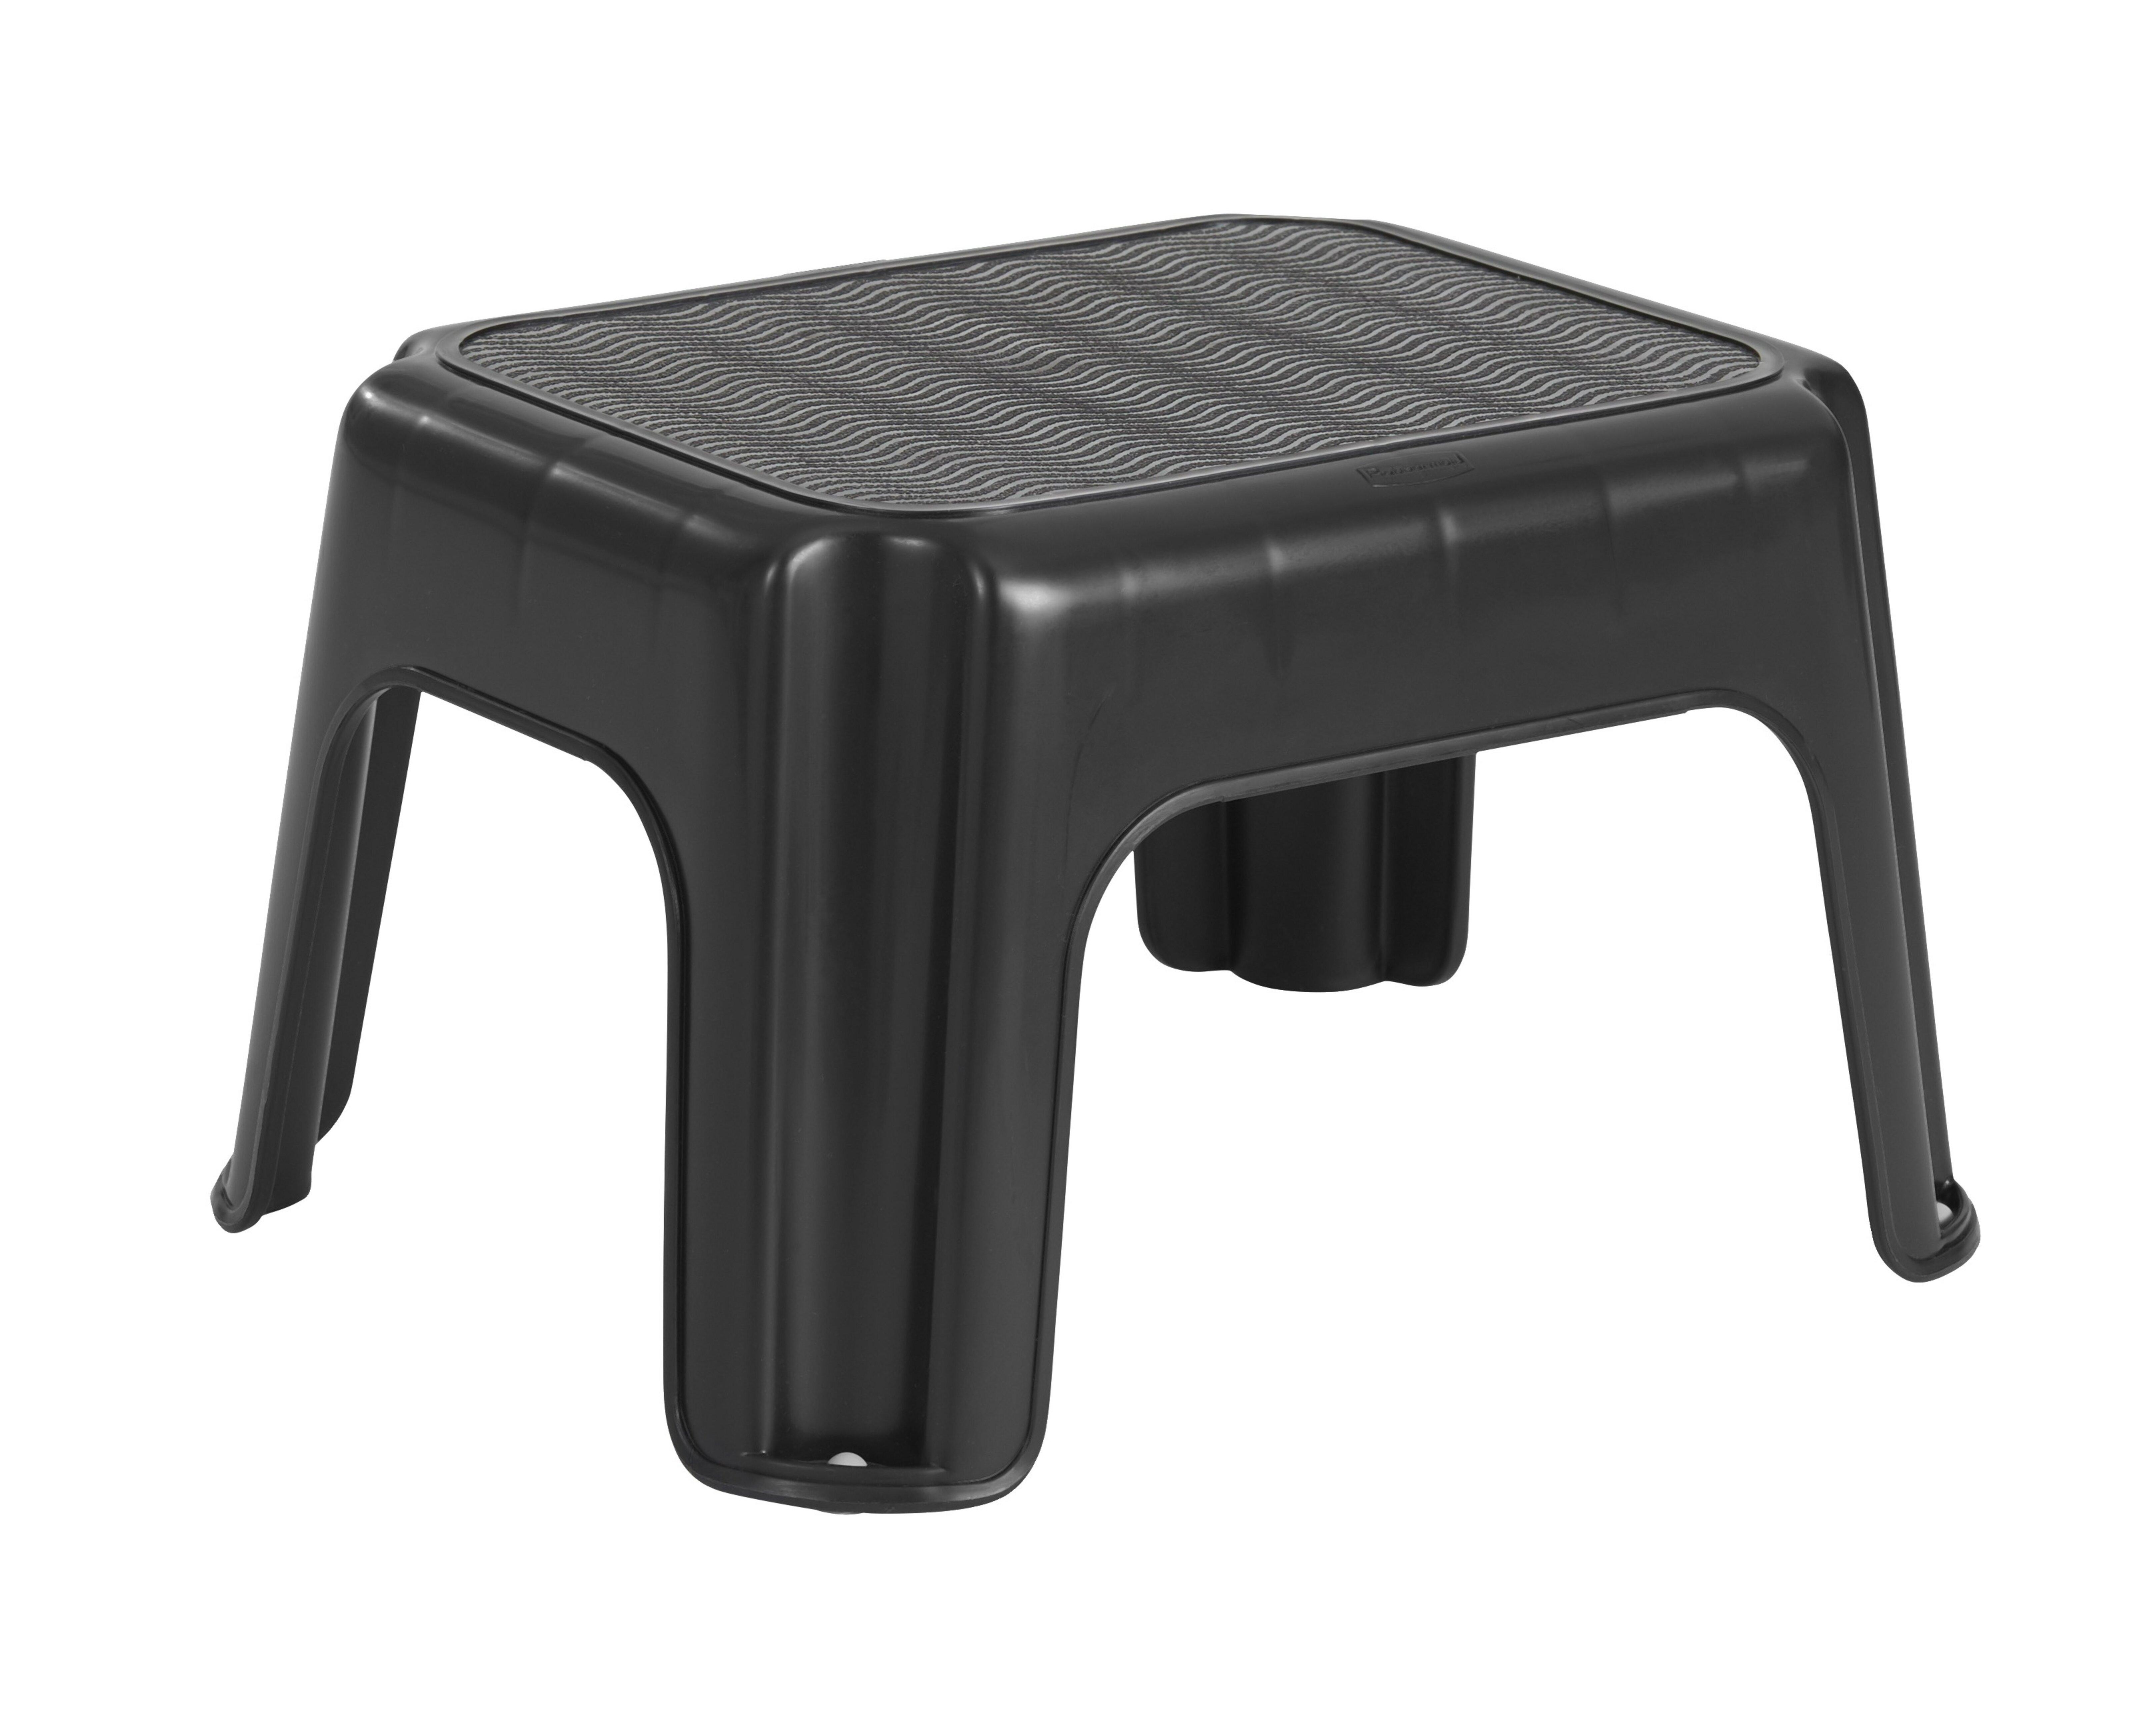 Rubbermaid 1 Step Plastic Step Stool With 200 Lb Load Capacity Wayfair